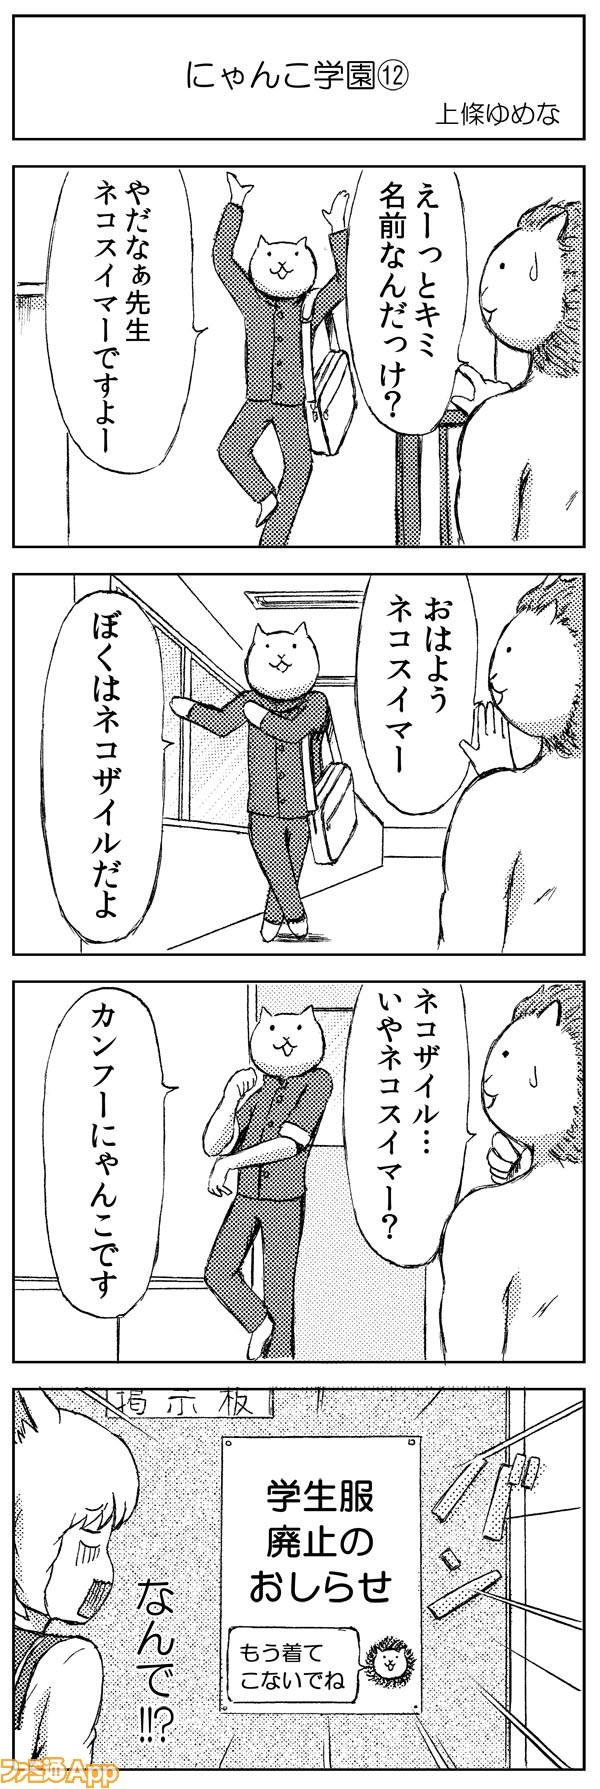 03kami_072